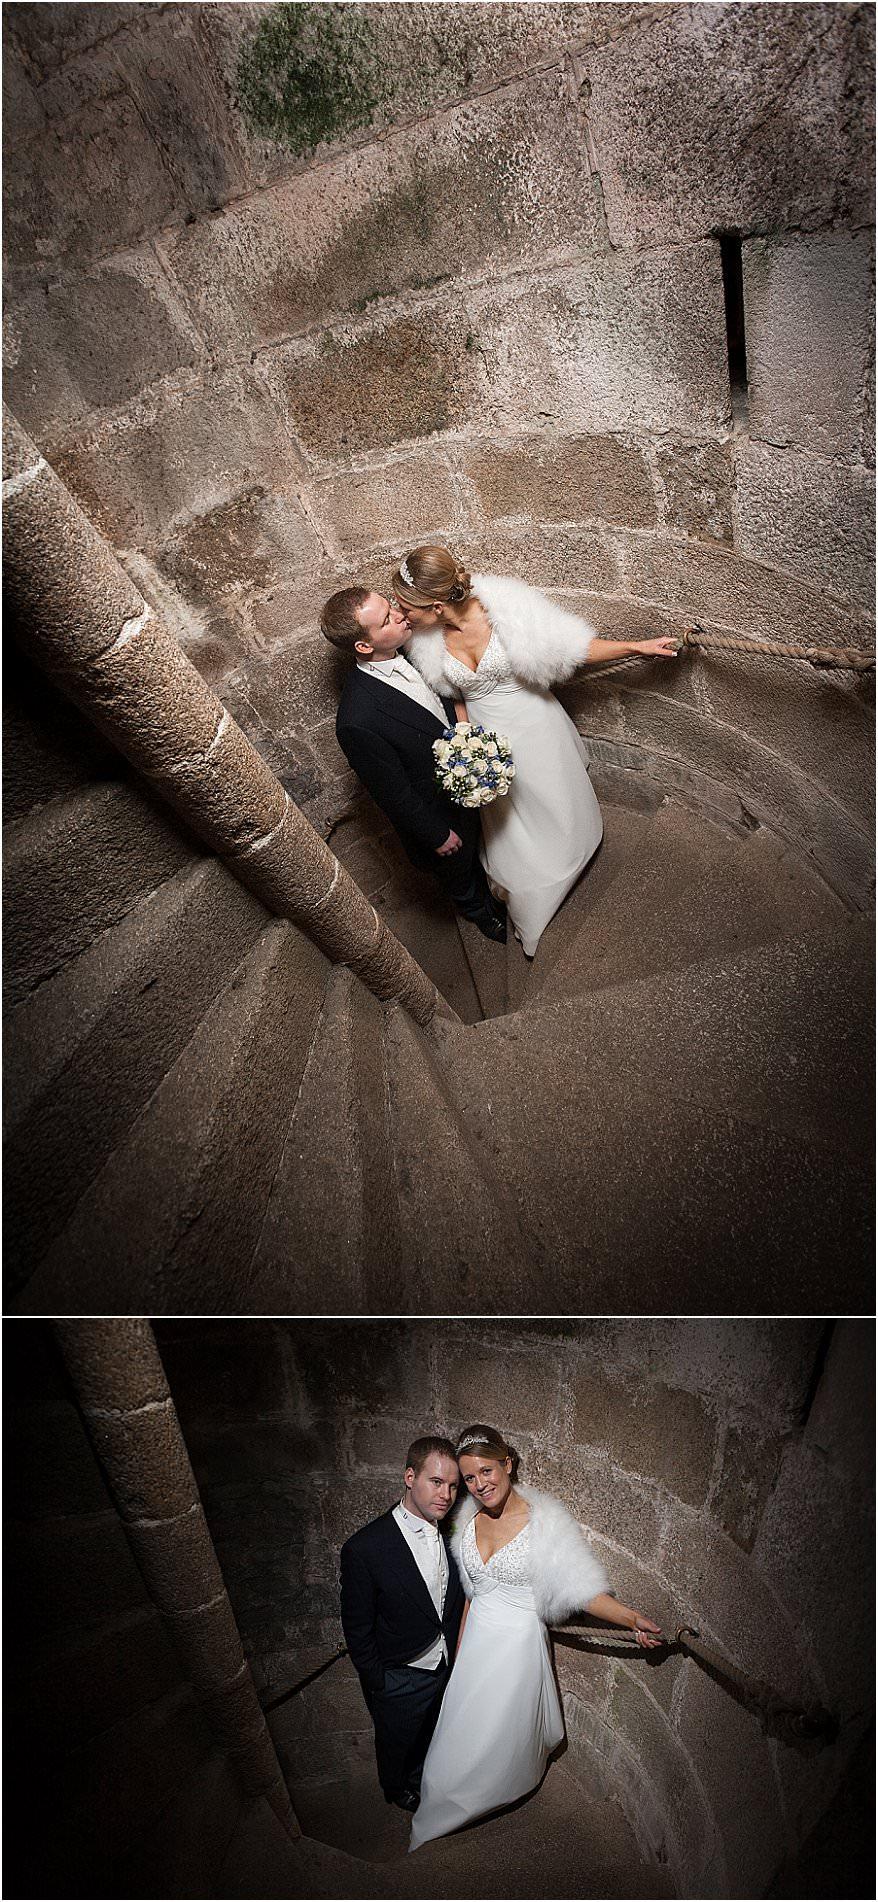 wedding at pendennis castle 1 wedding photographer cornwall